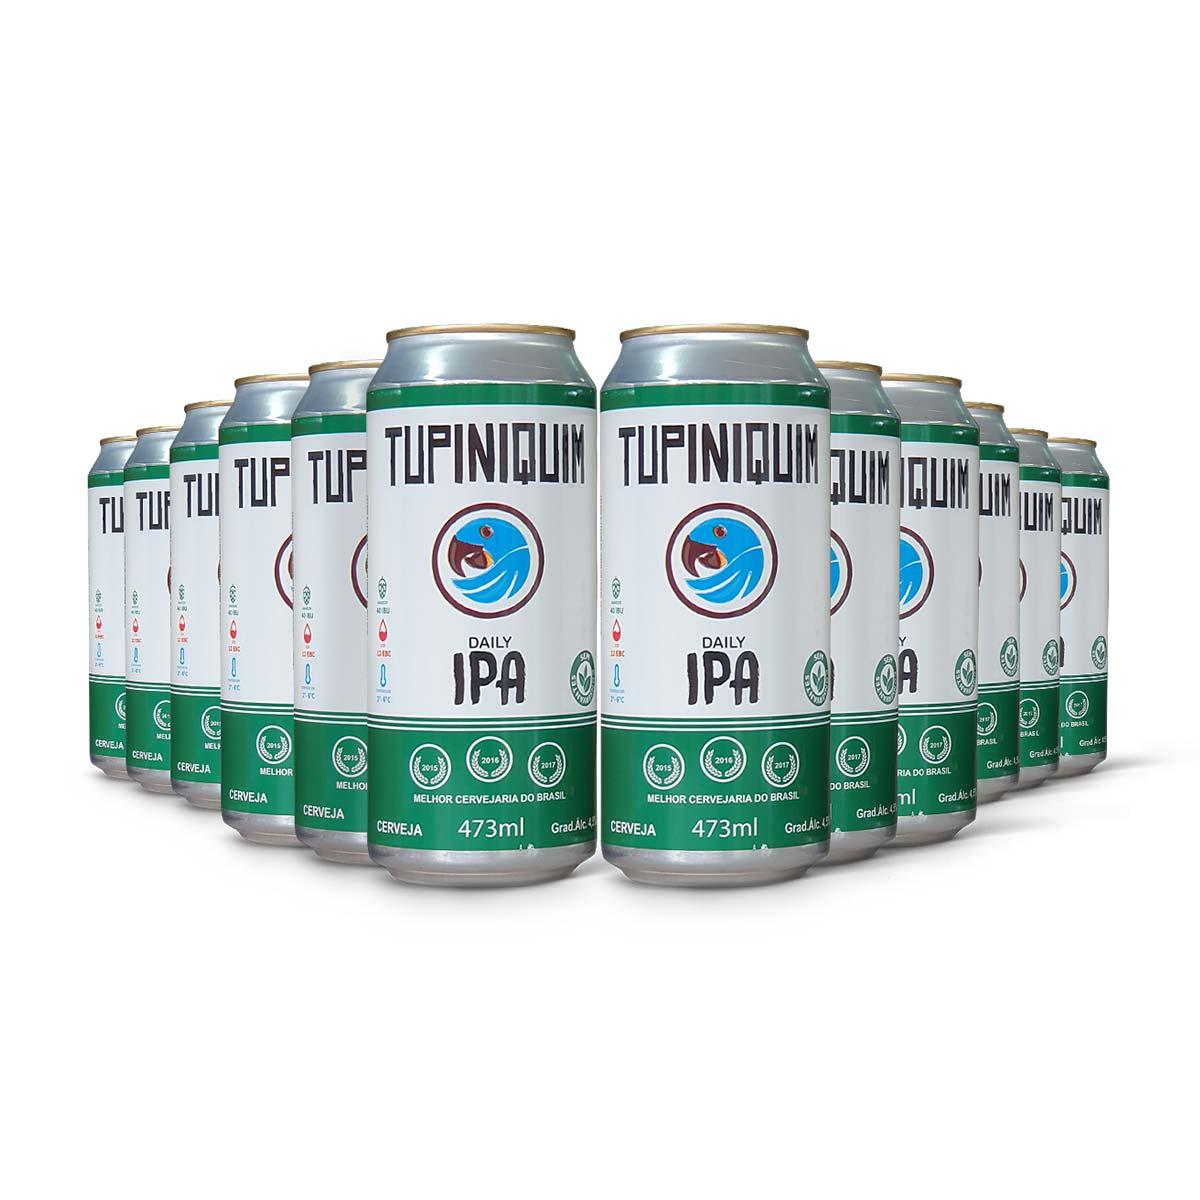 Pack Tupiniquim Daily IPA 12 cervejas 473ml